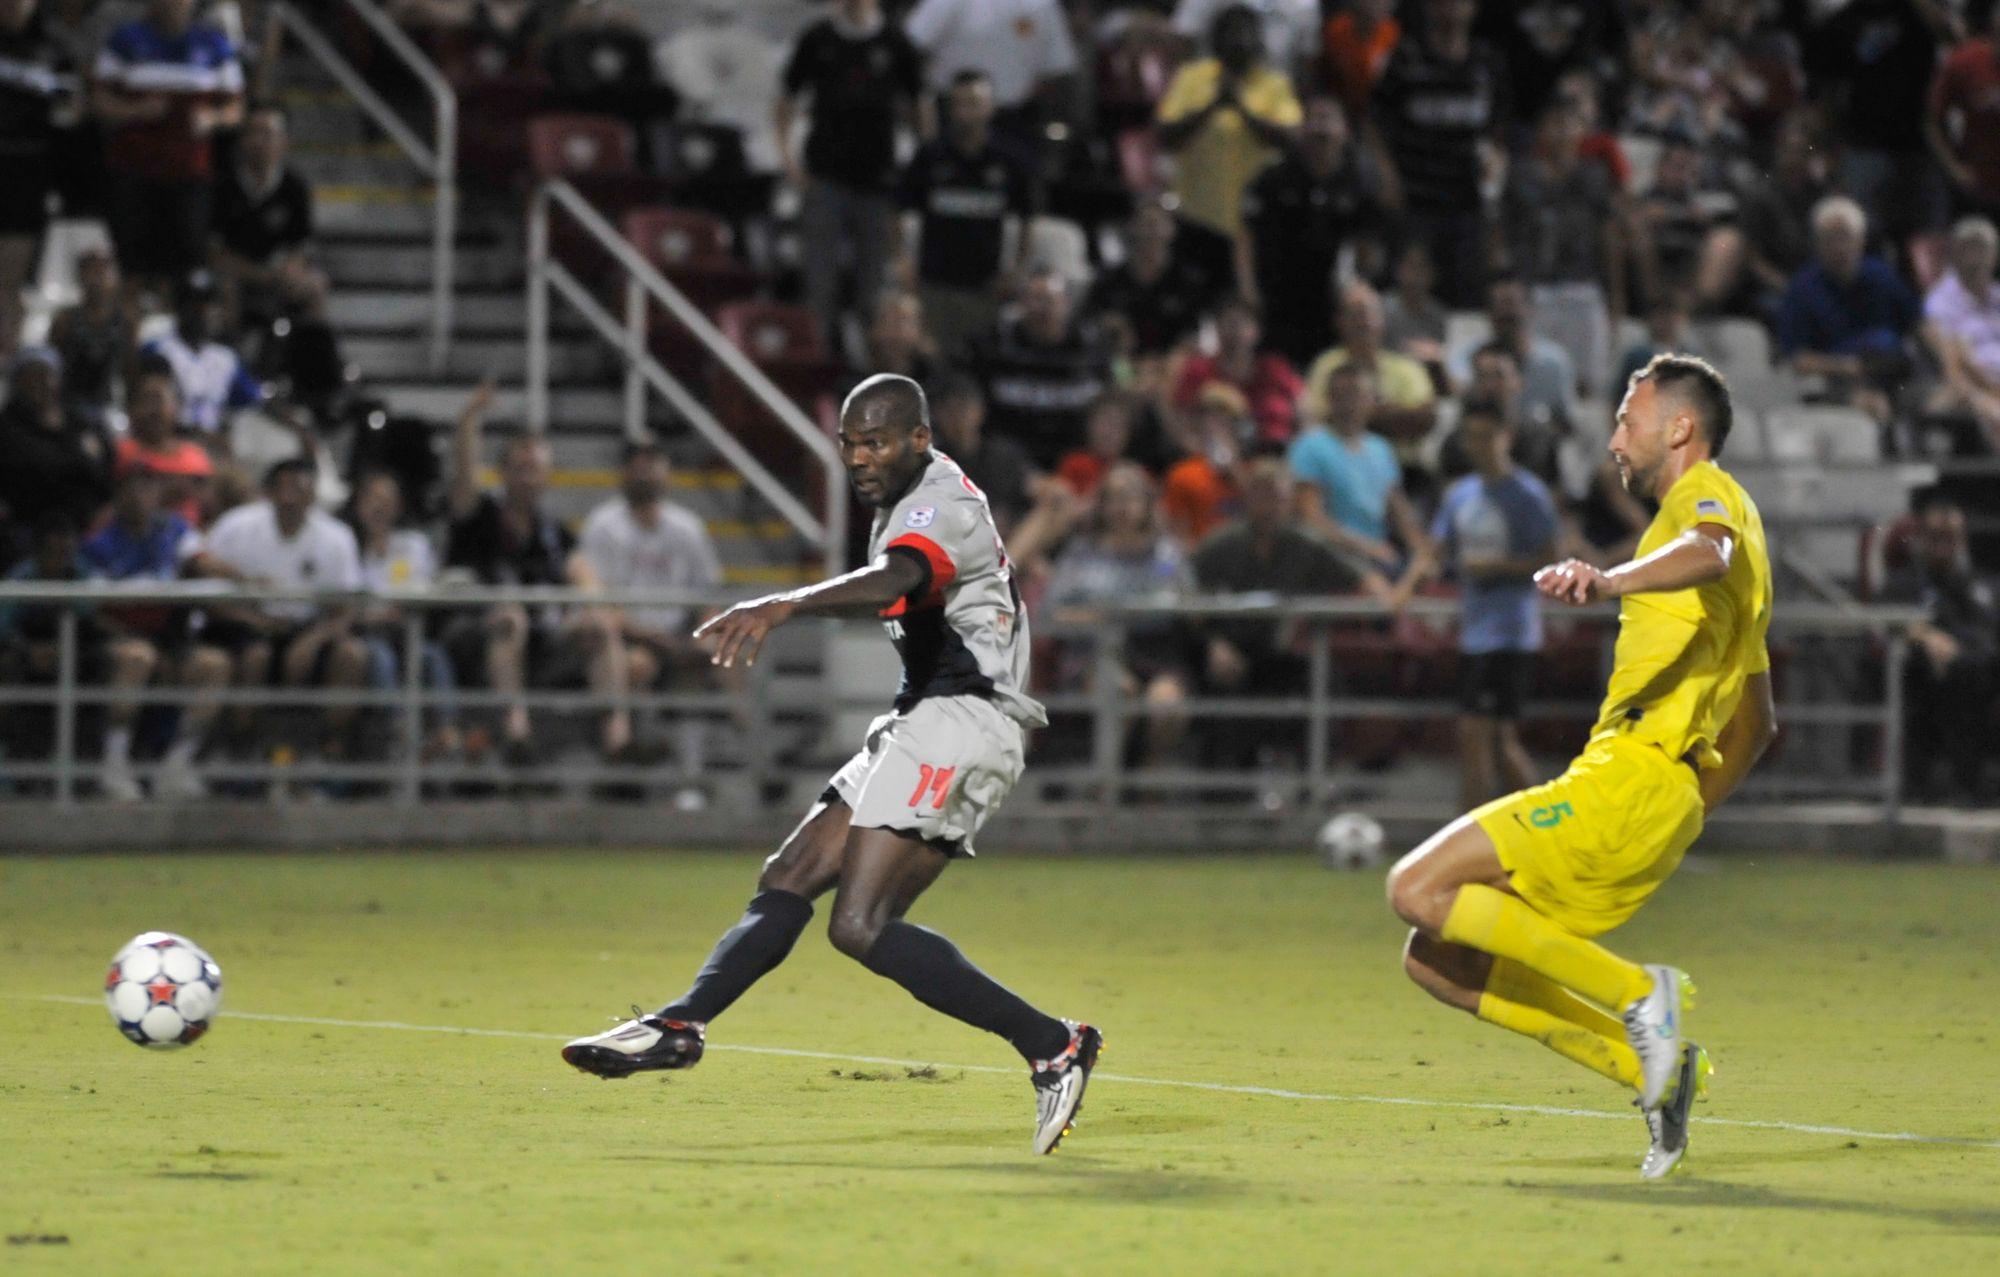 Cummings gets past Antonijevic to take the shot (Photo: San Antonio Scorpions)